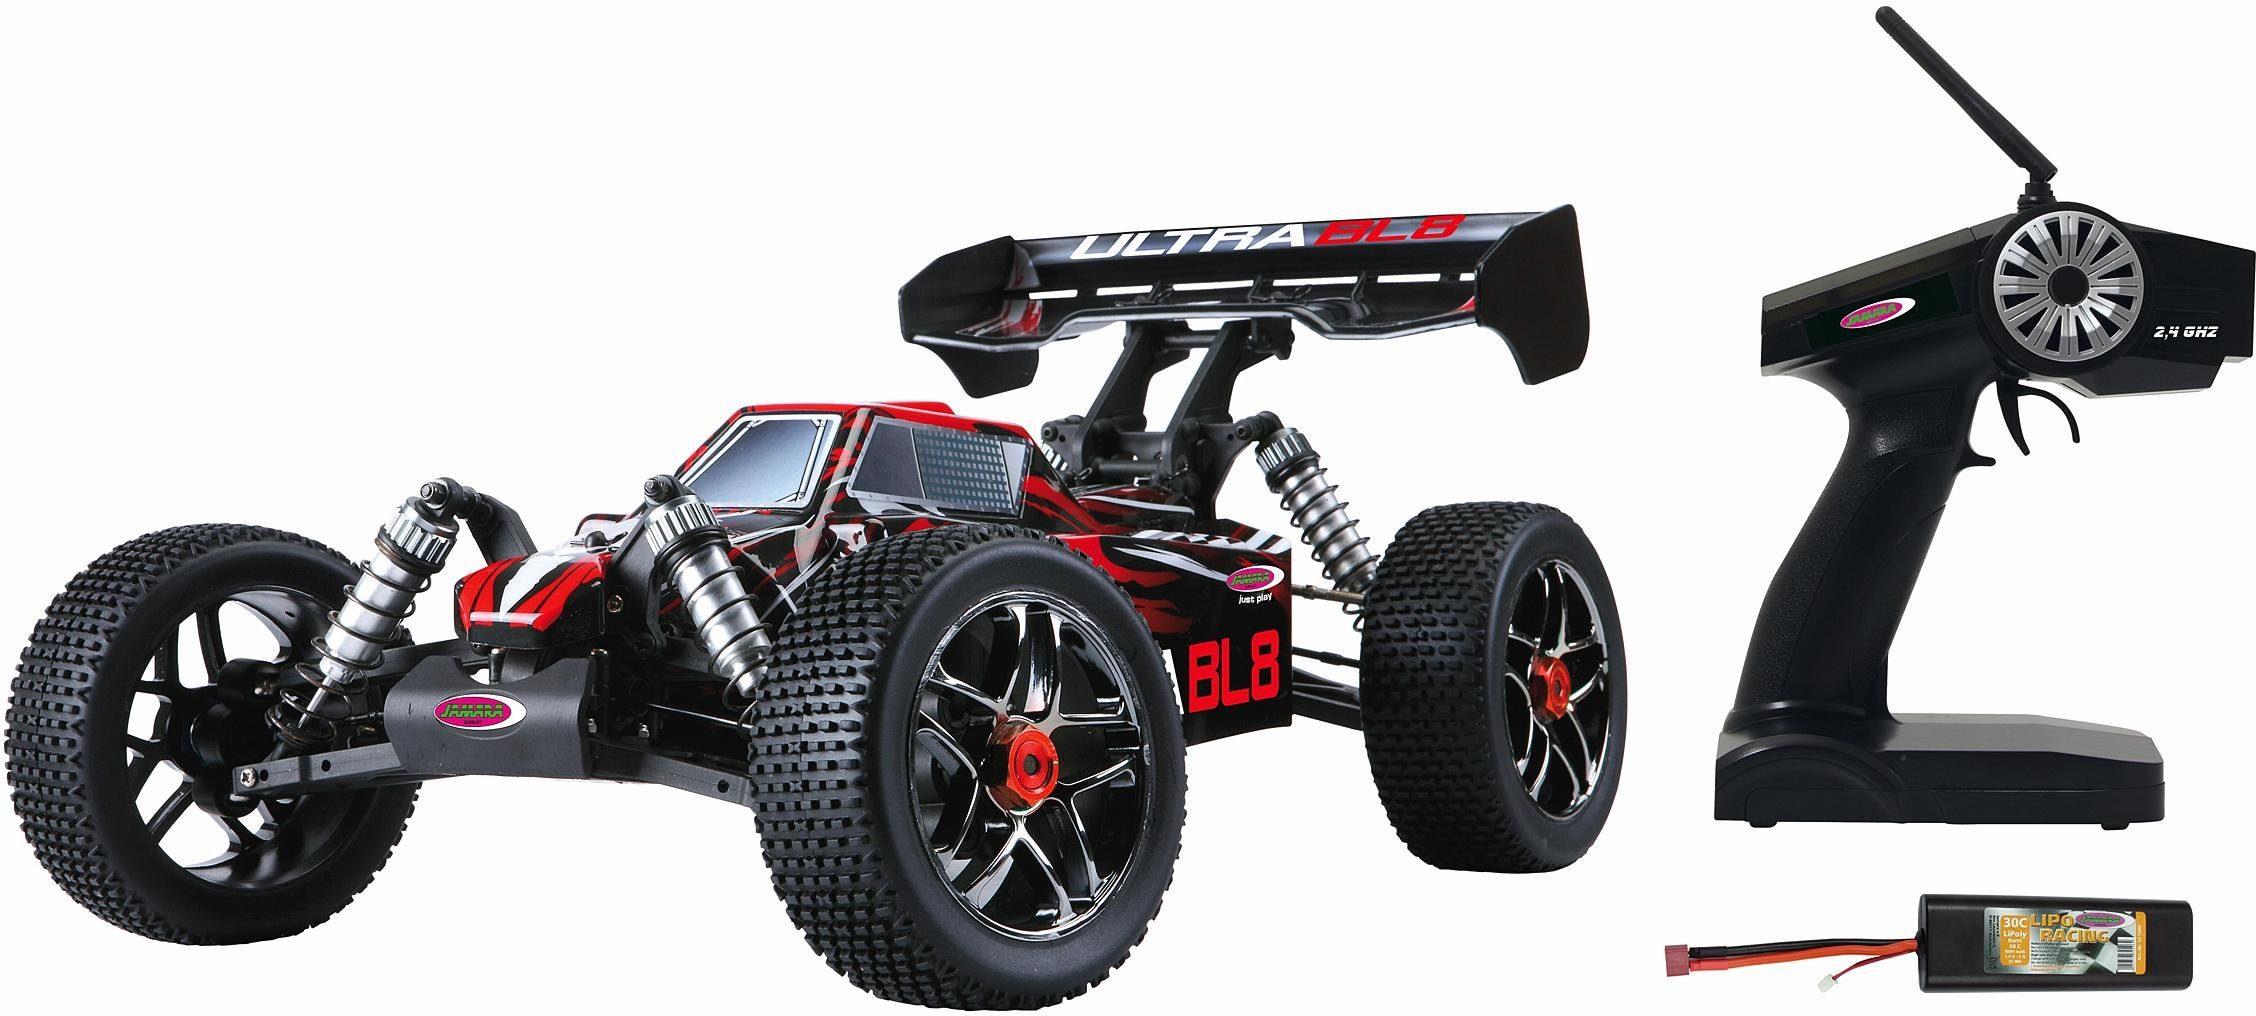 JAMARA RC Buggy, »Ultra BL8 LIPO 4WD, 1:8, 2,4 GHz«